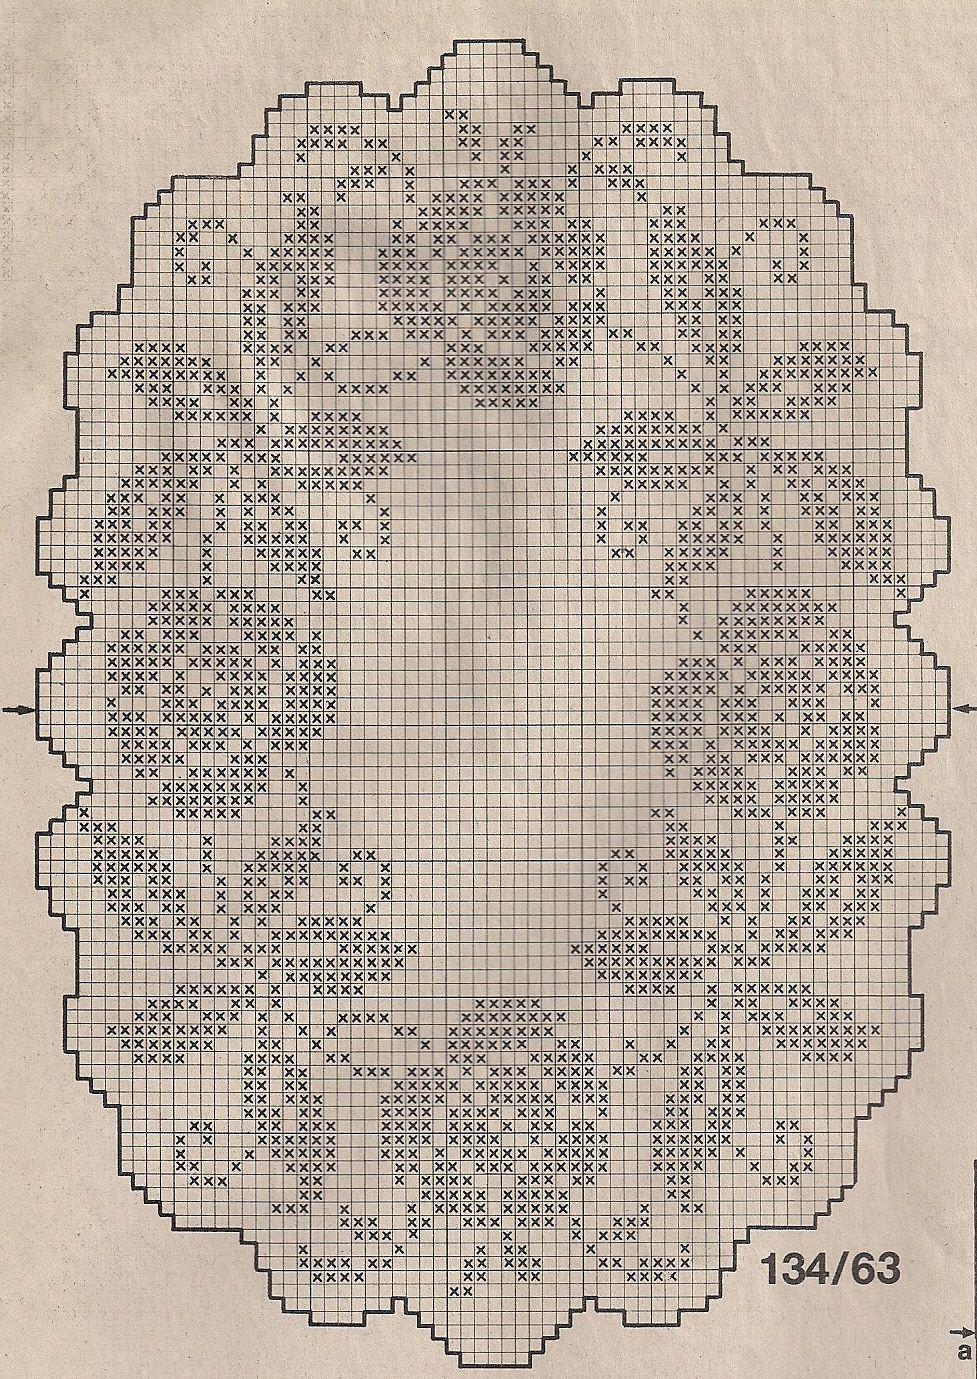 filet crochet placemat chart crochet pinterest tricot crochet and napperon crochet. Black Bedroom Furniture Sets. Home Design Ideas